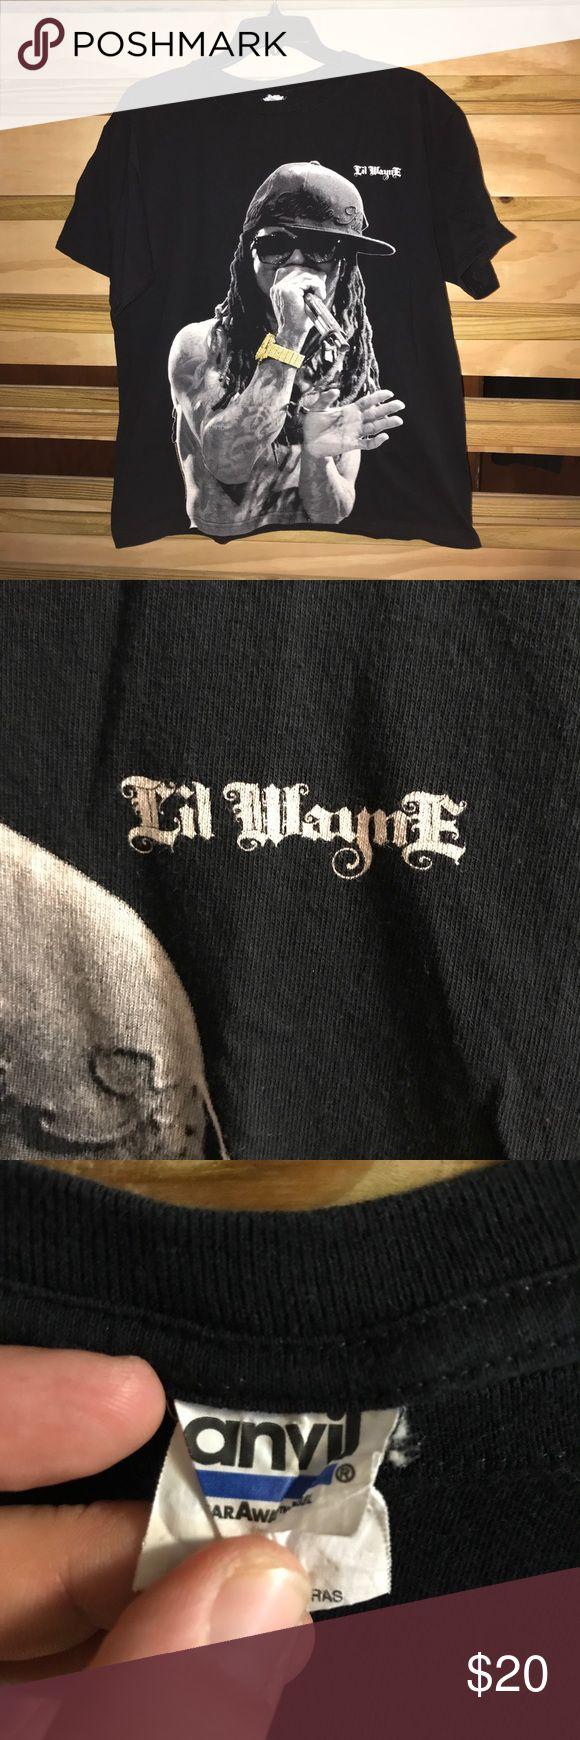 Vintage Lil Wayne T-shirt Early 2000's vintage Lil Wayne T-shirt band tees Shirts Tees - Short Sleeve